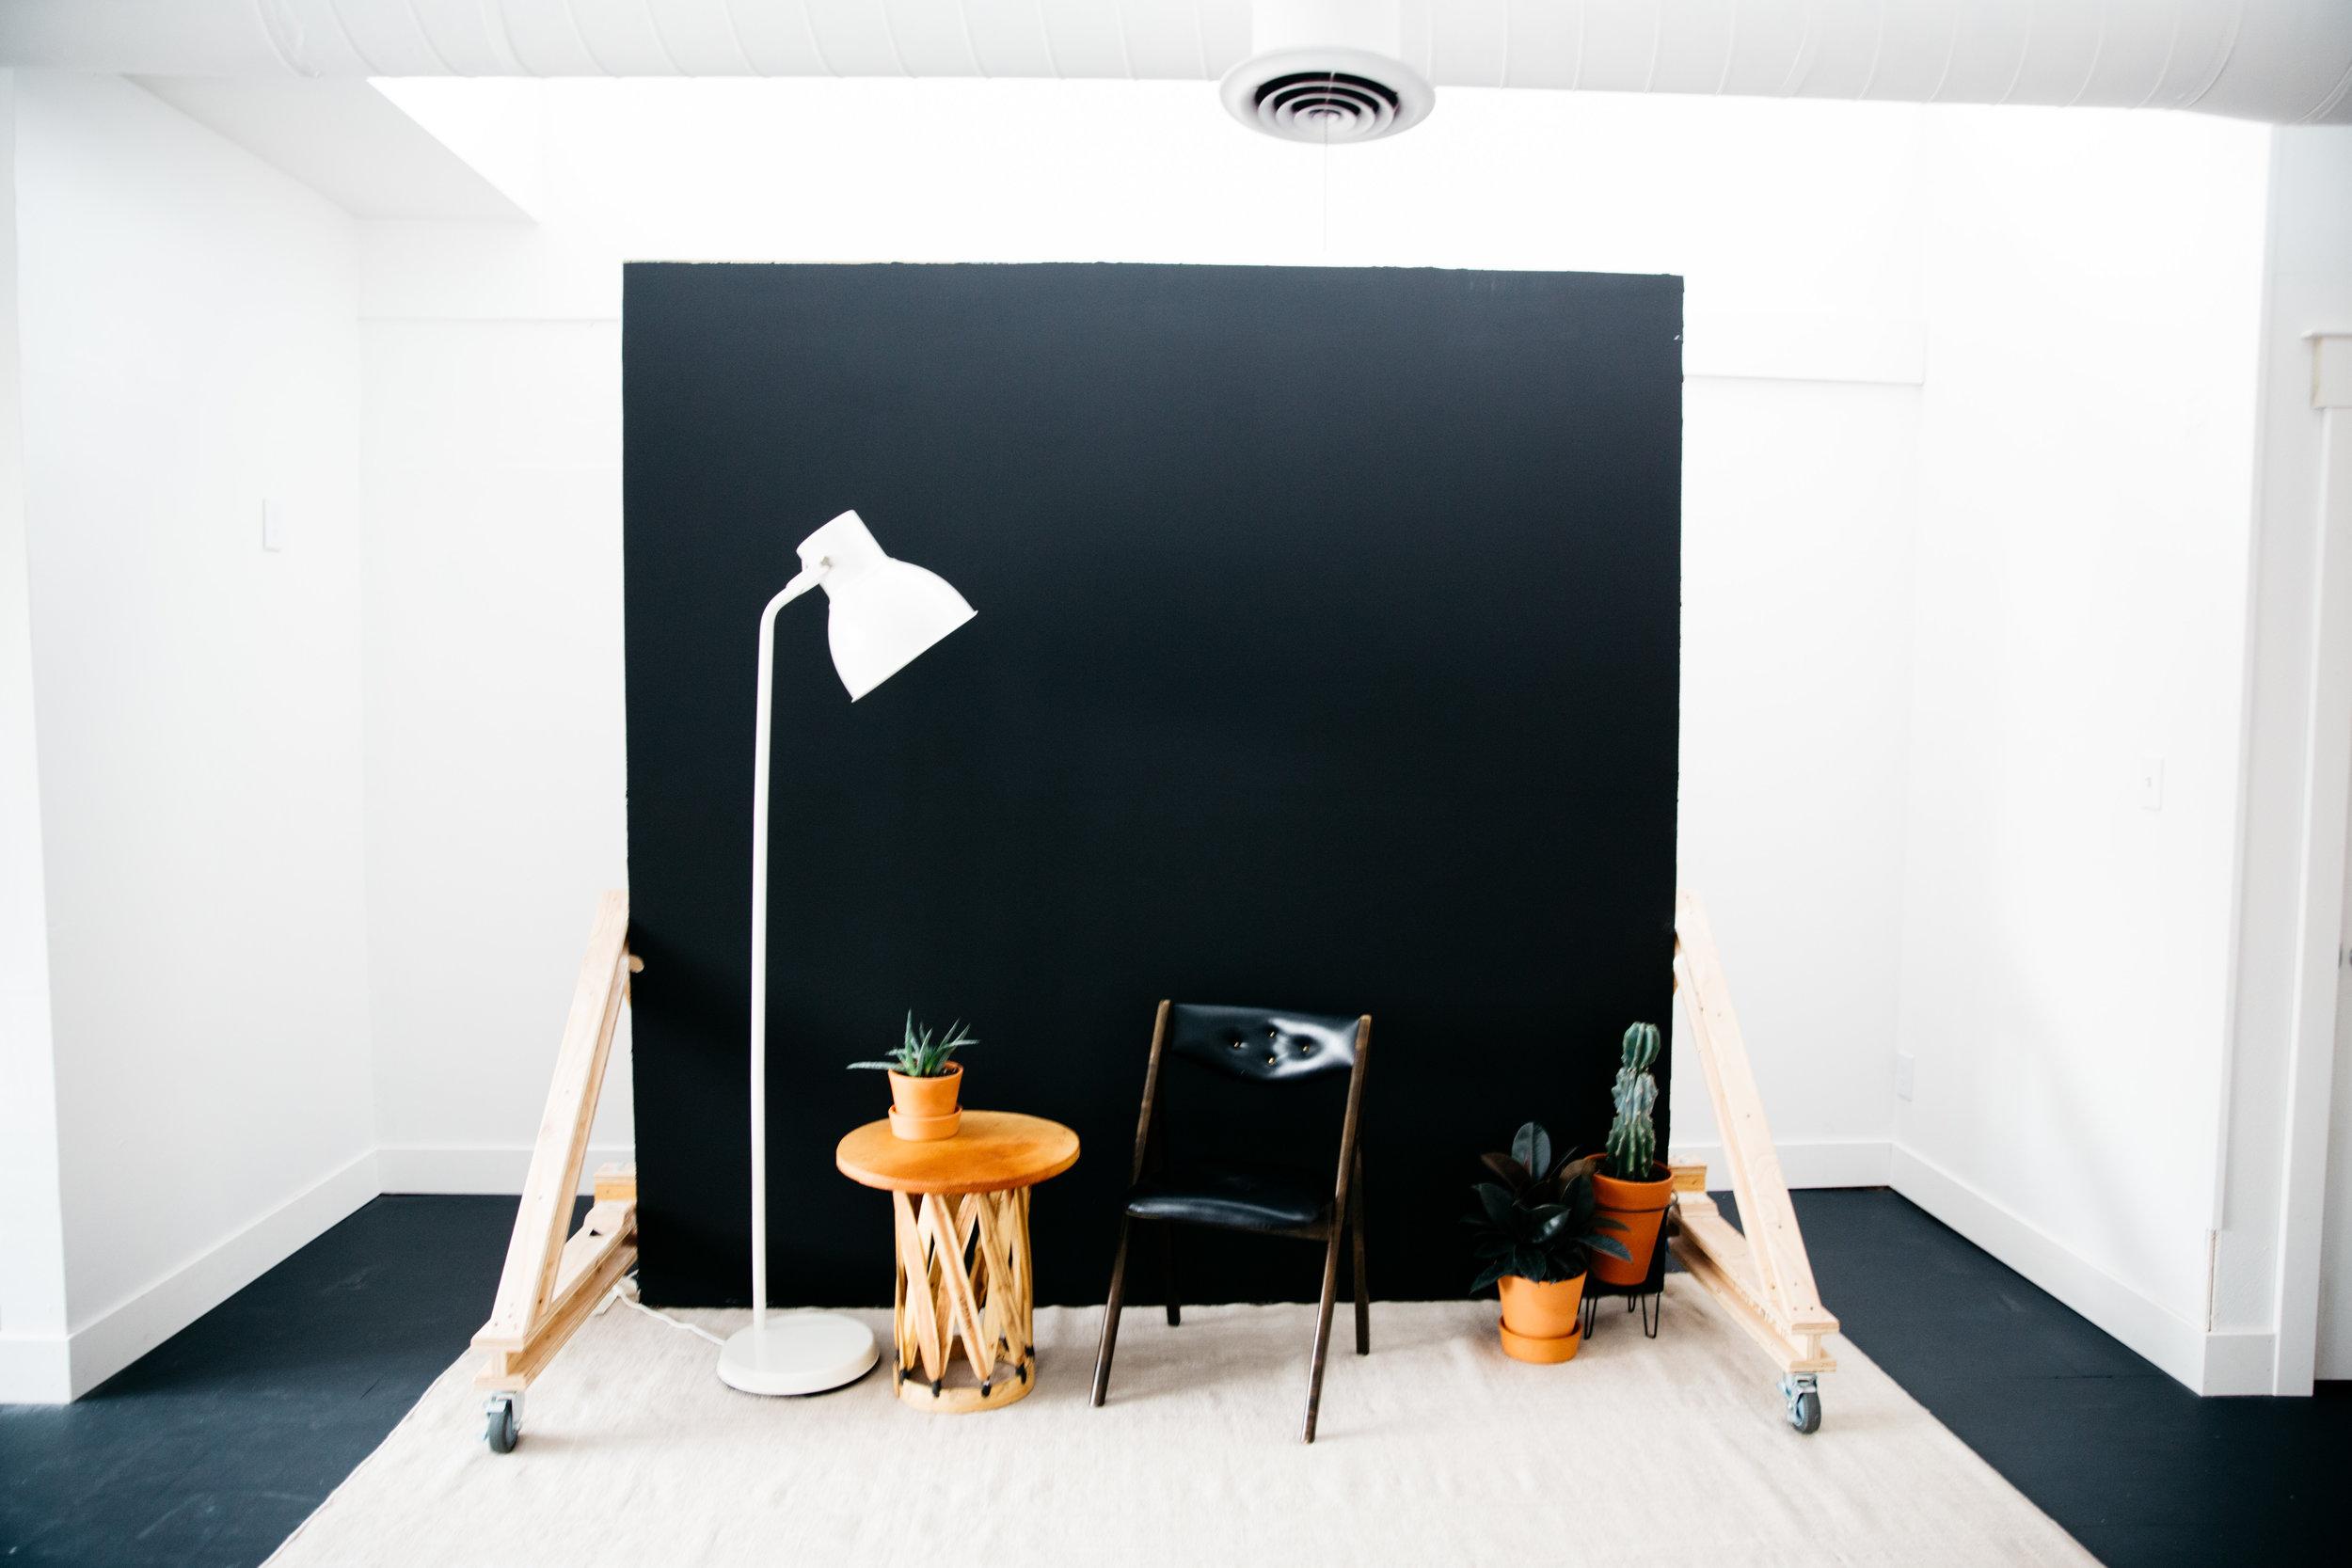 colorado-springs-photography-rental-studio-6.jpg